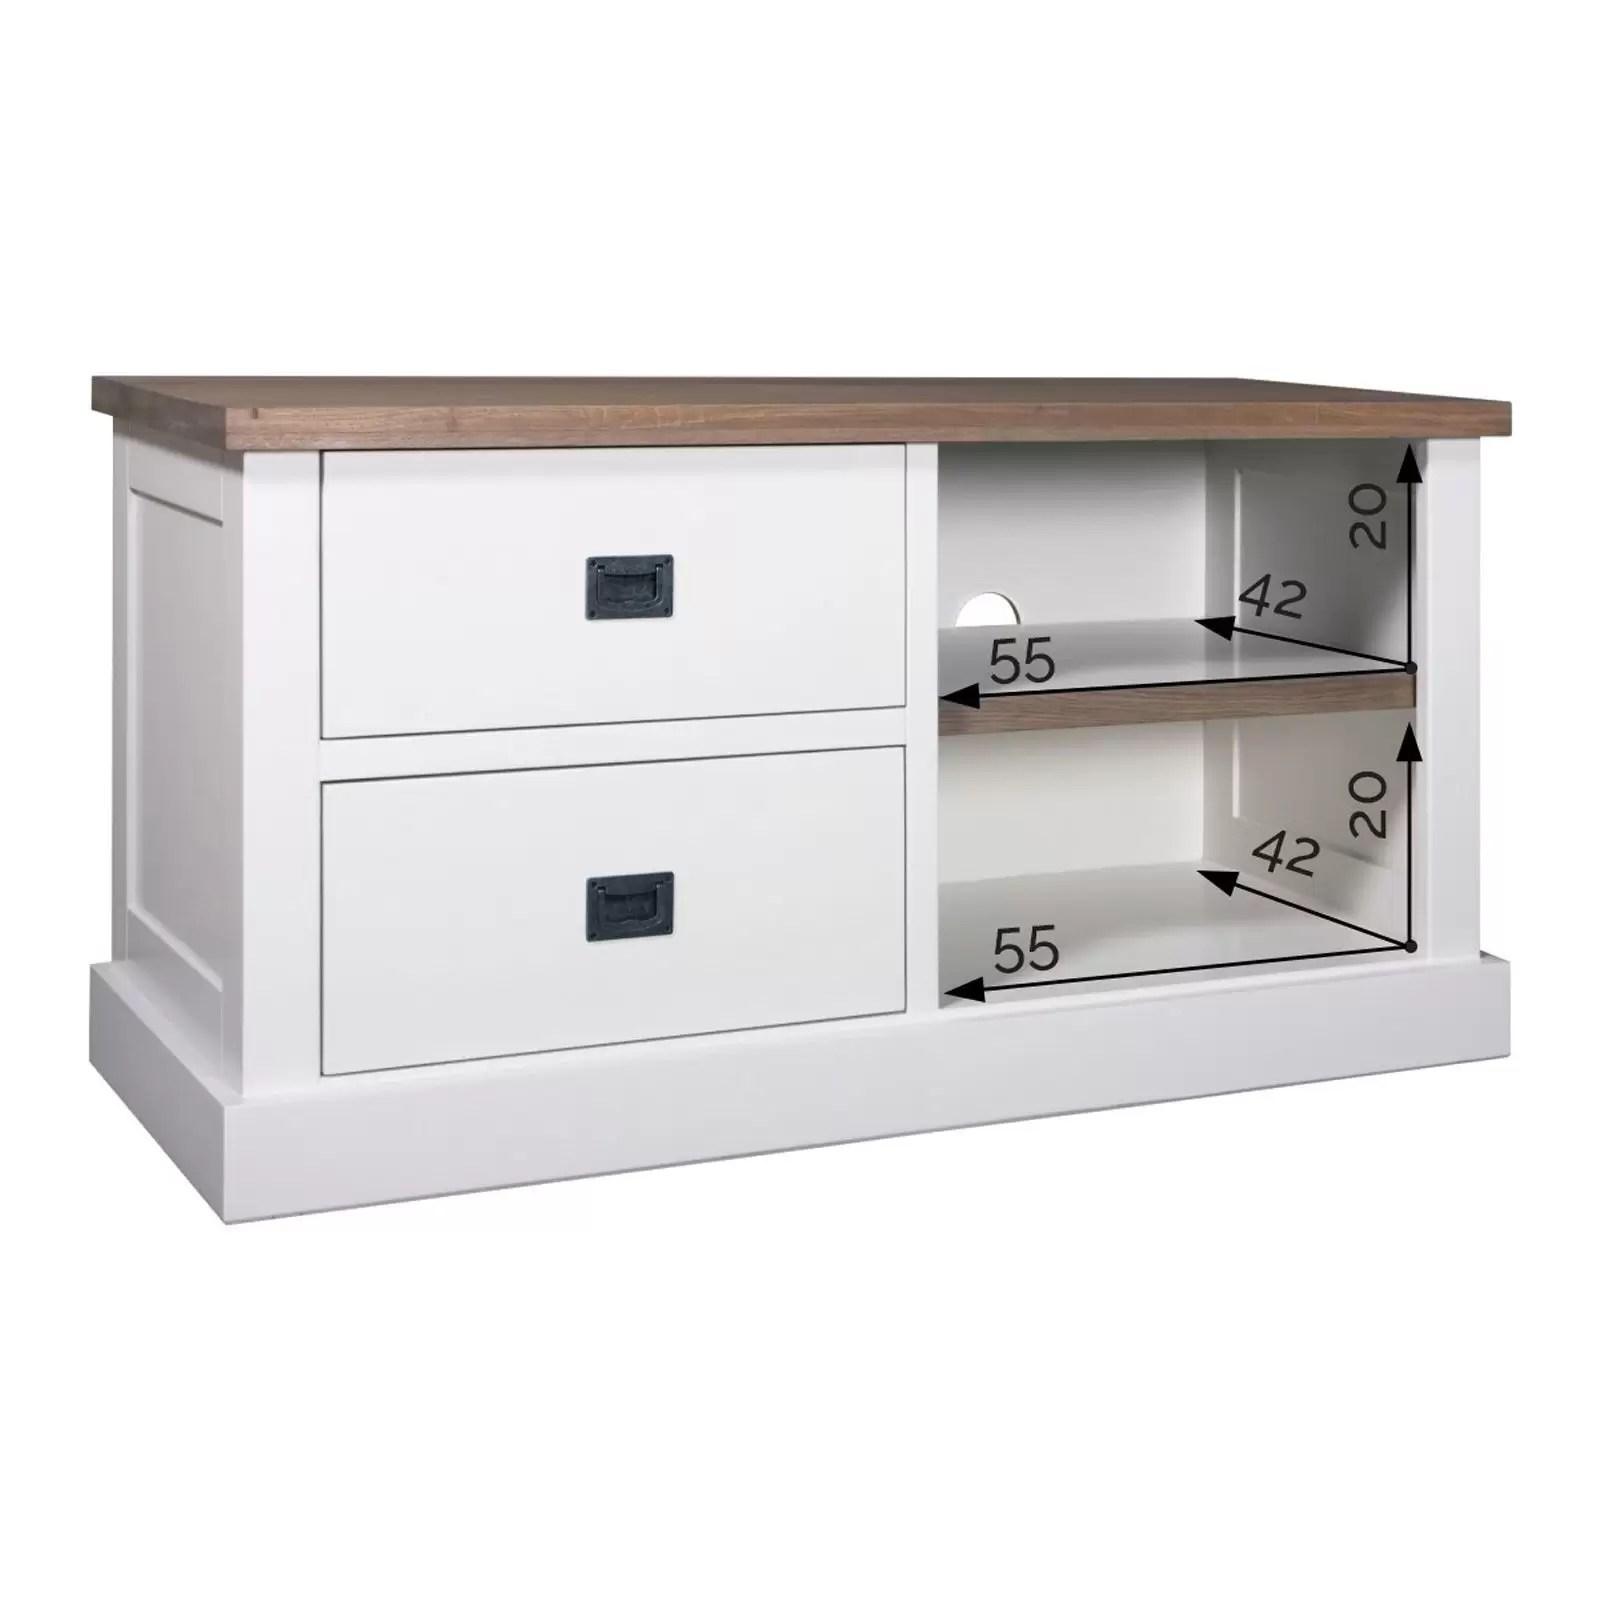 meuble tv 2 tiroirs chene et pin chic